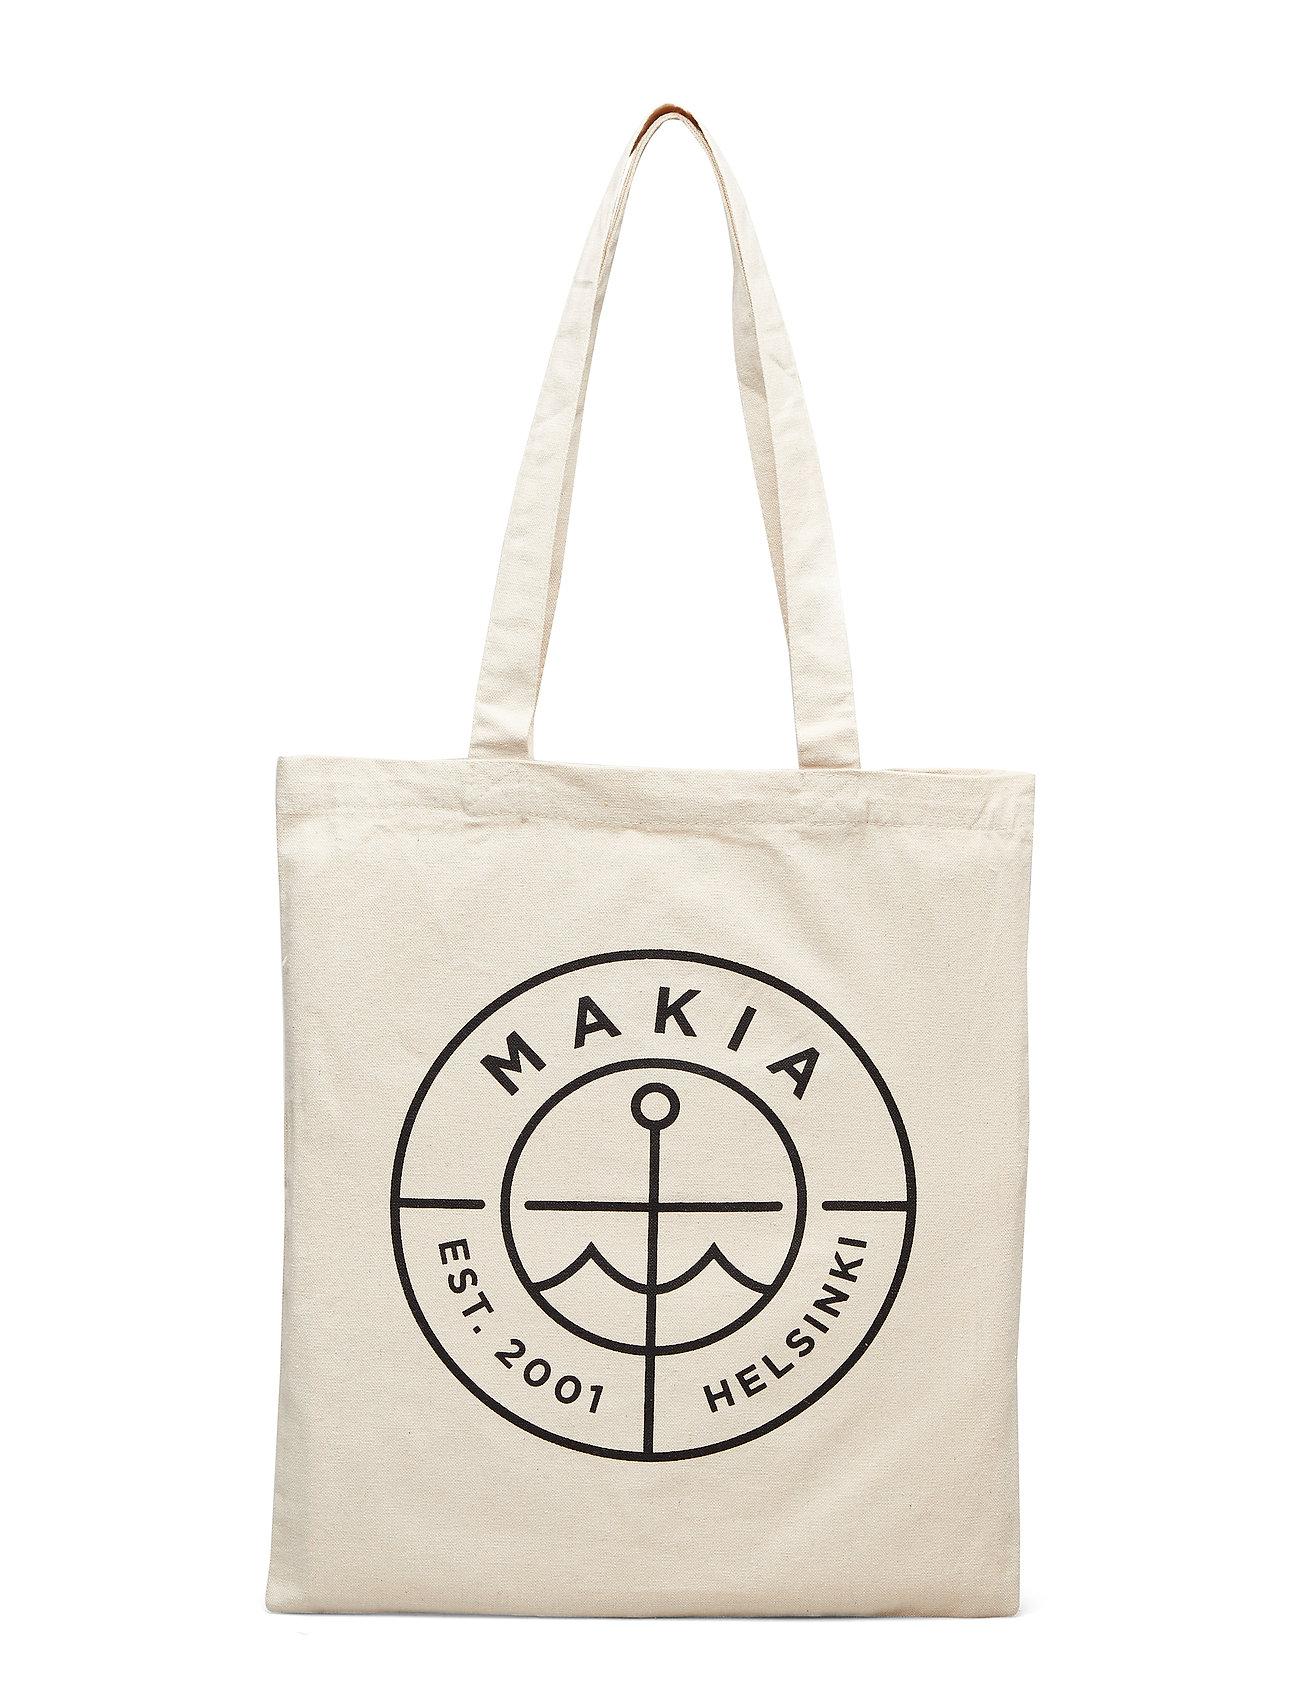 Makia Range Tote Bag - ECRU